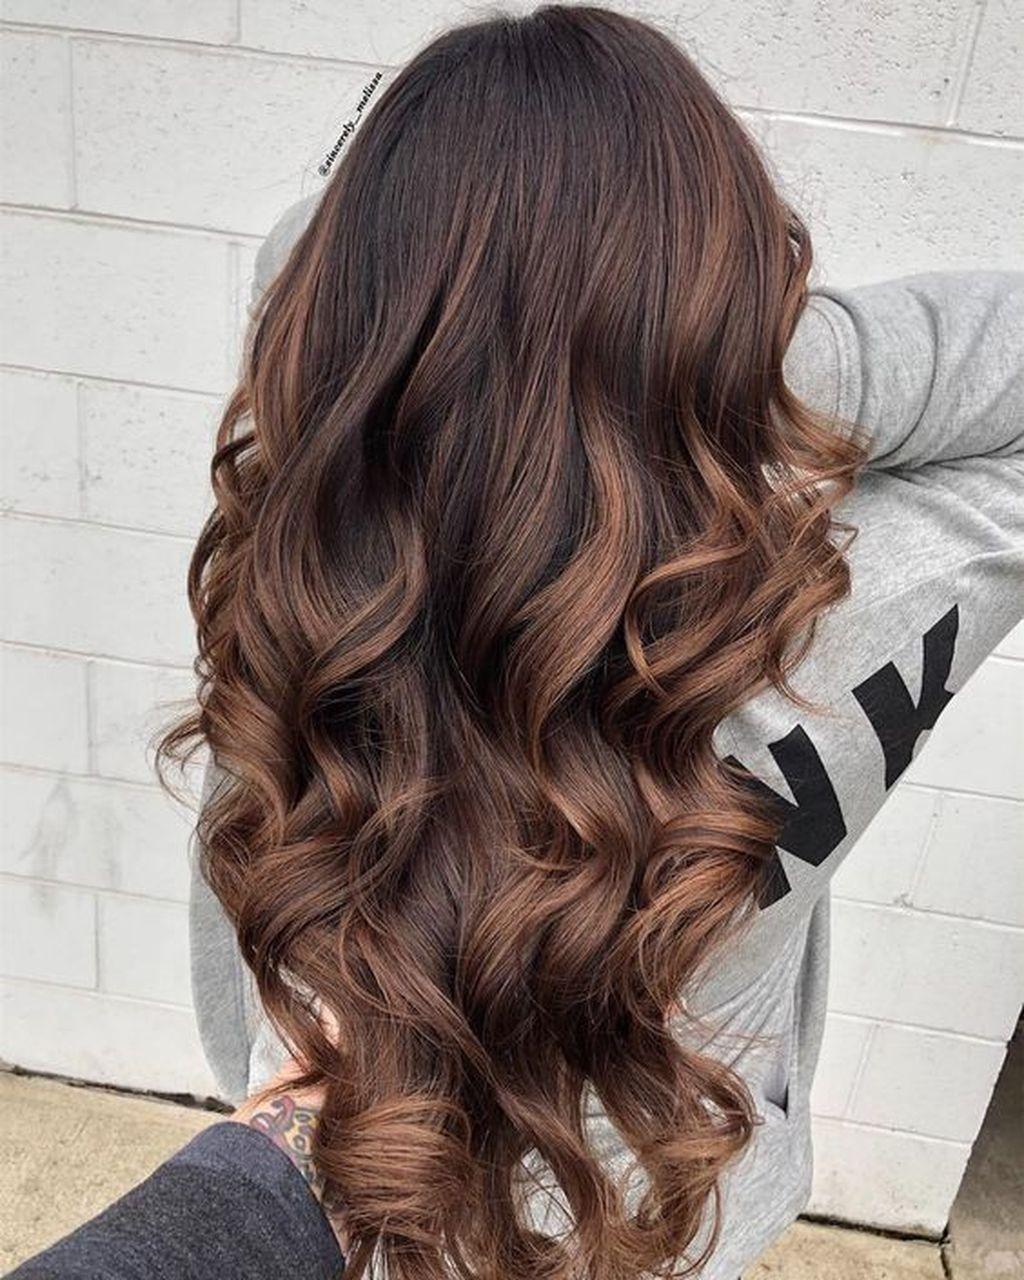 30+ Wonderful Balayage Hair Color Ideas For 2019